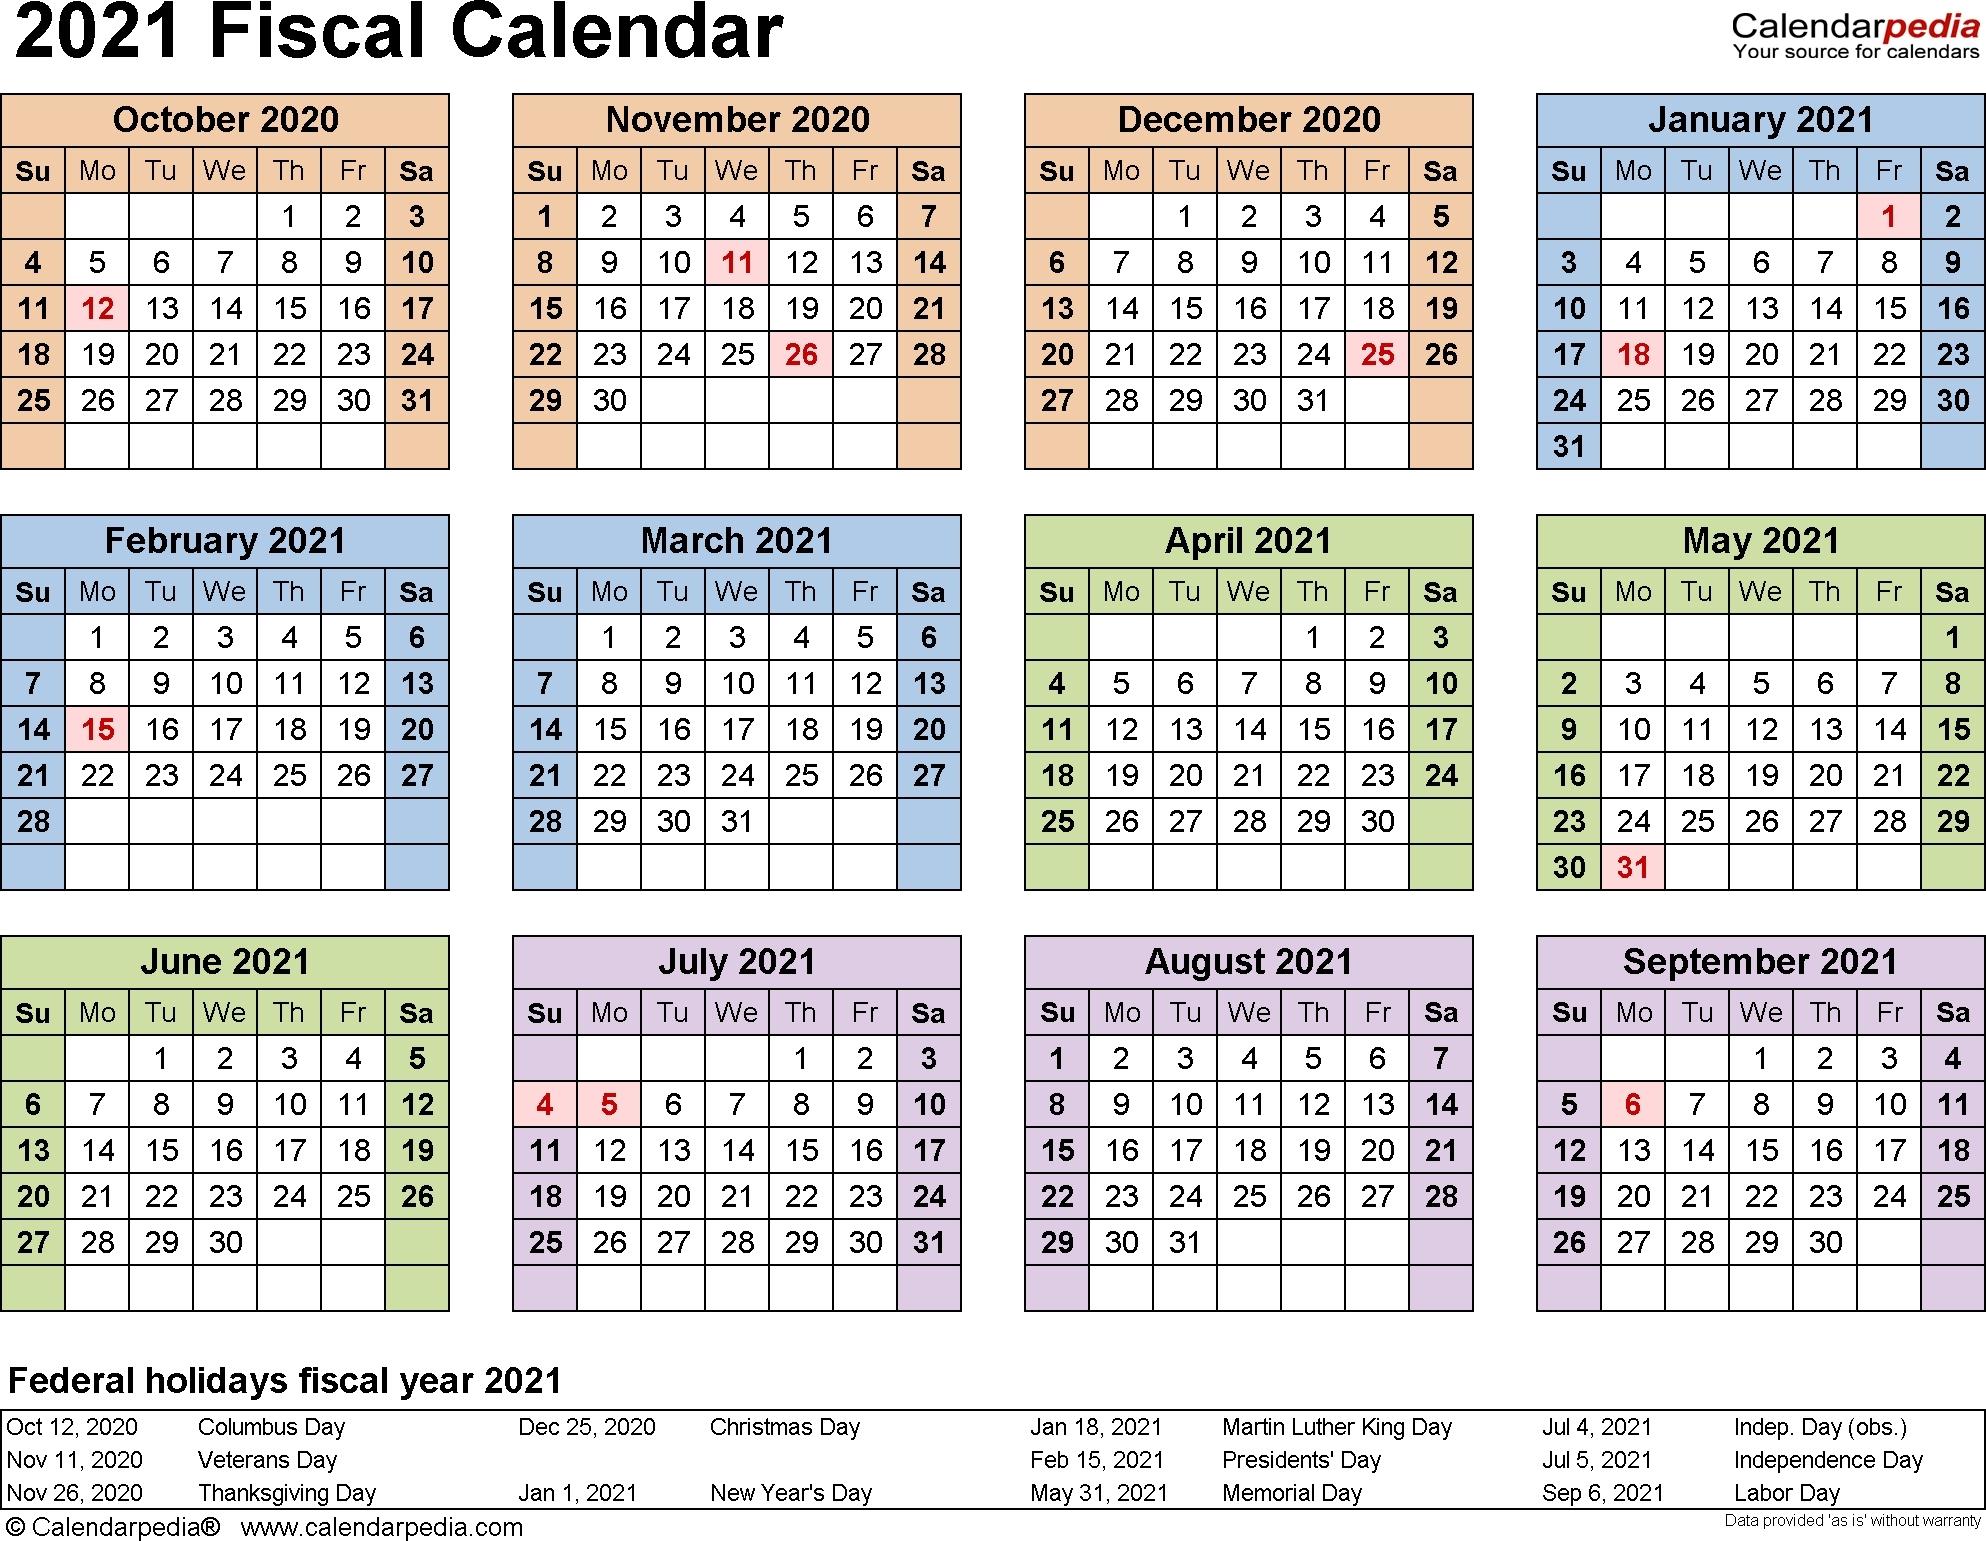 2019 Fiscal Calendar 4 4 5 - Calendar Inspiration Design